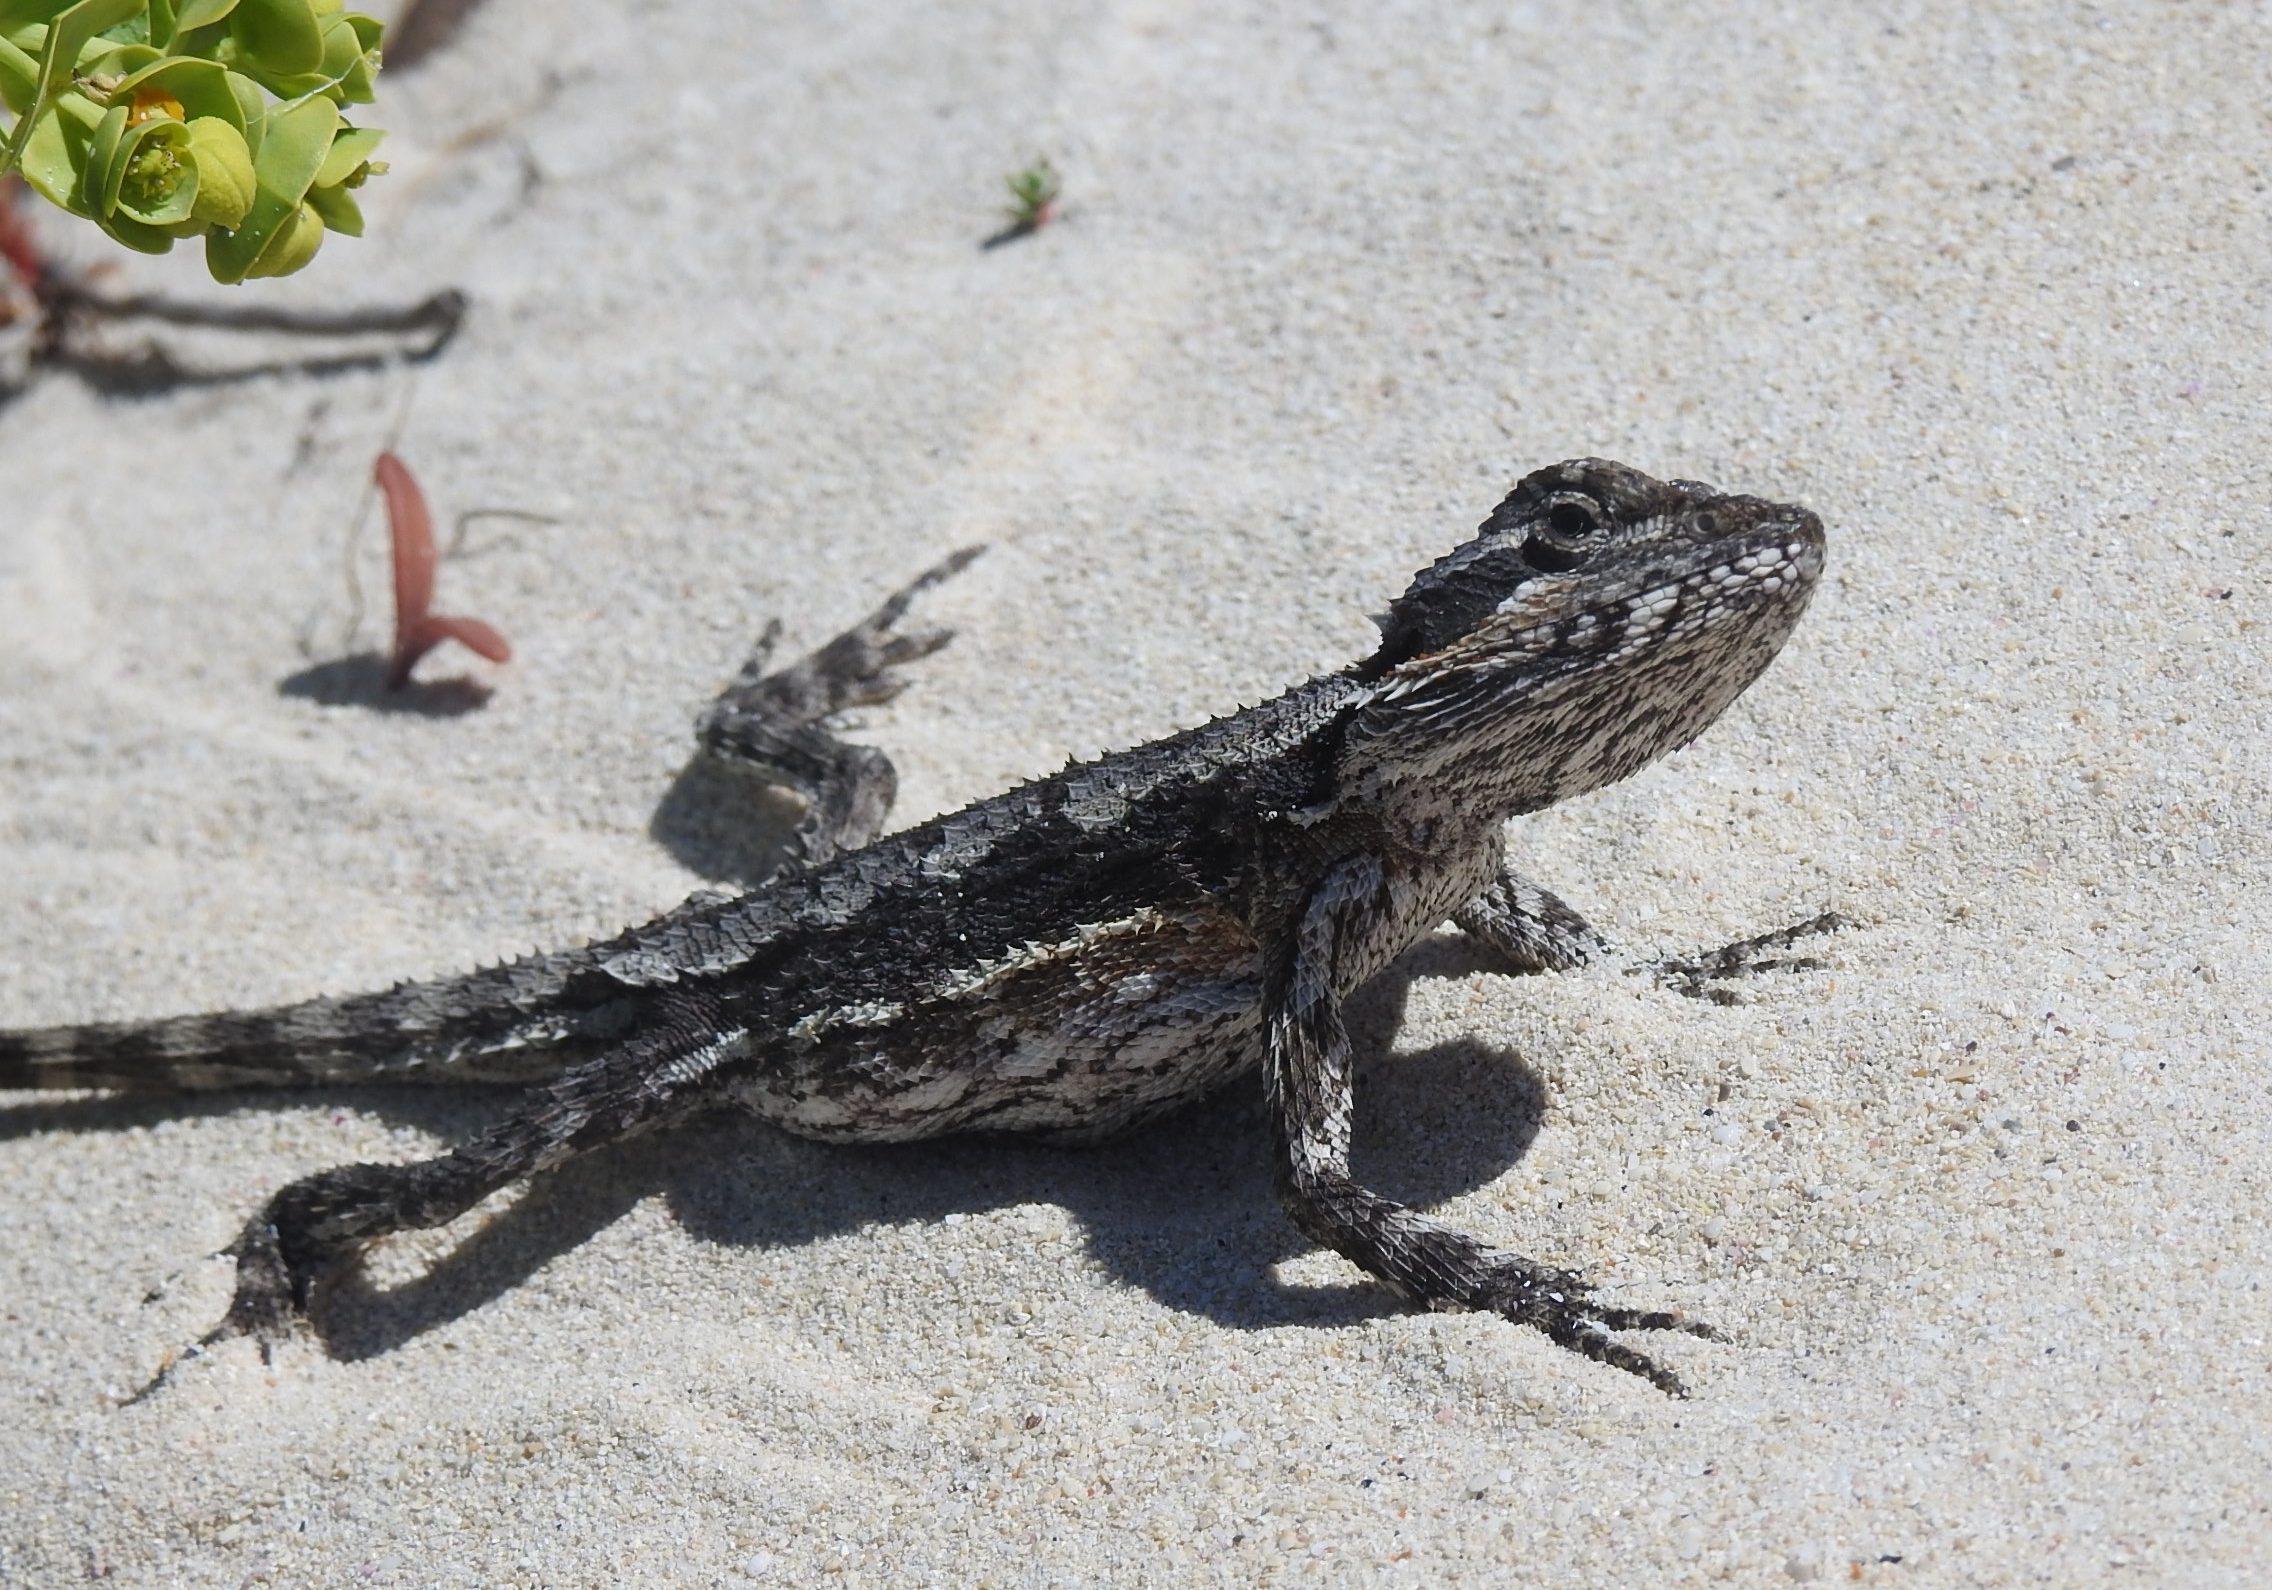 fauna on Cape to Cape Track